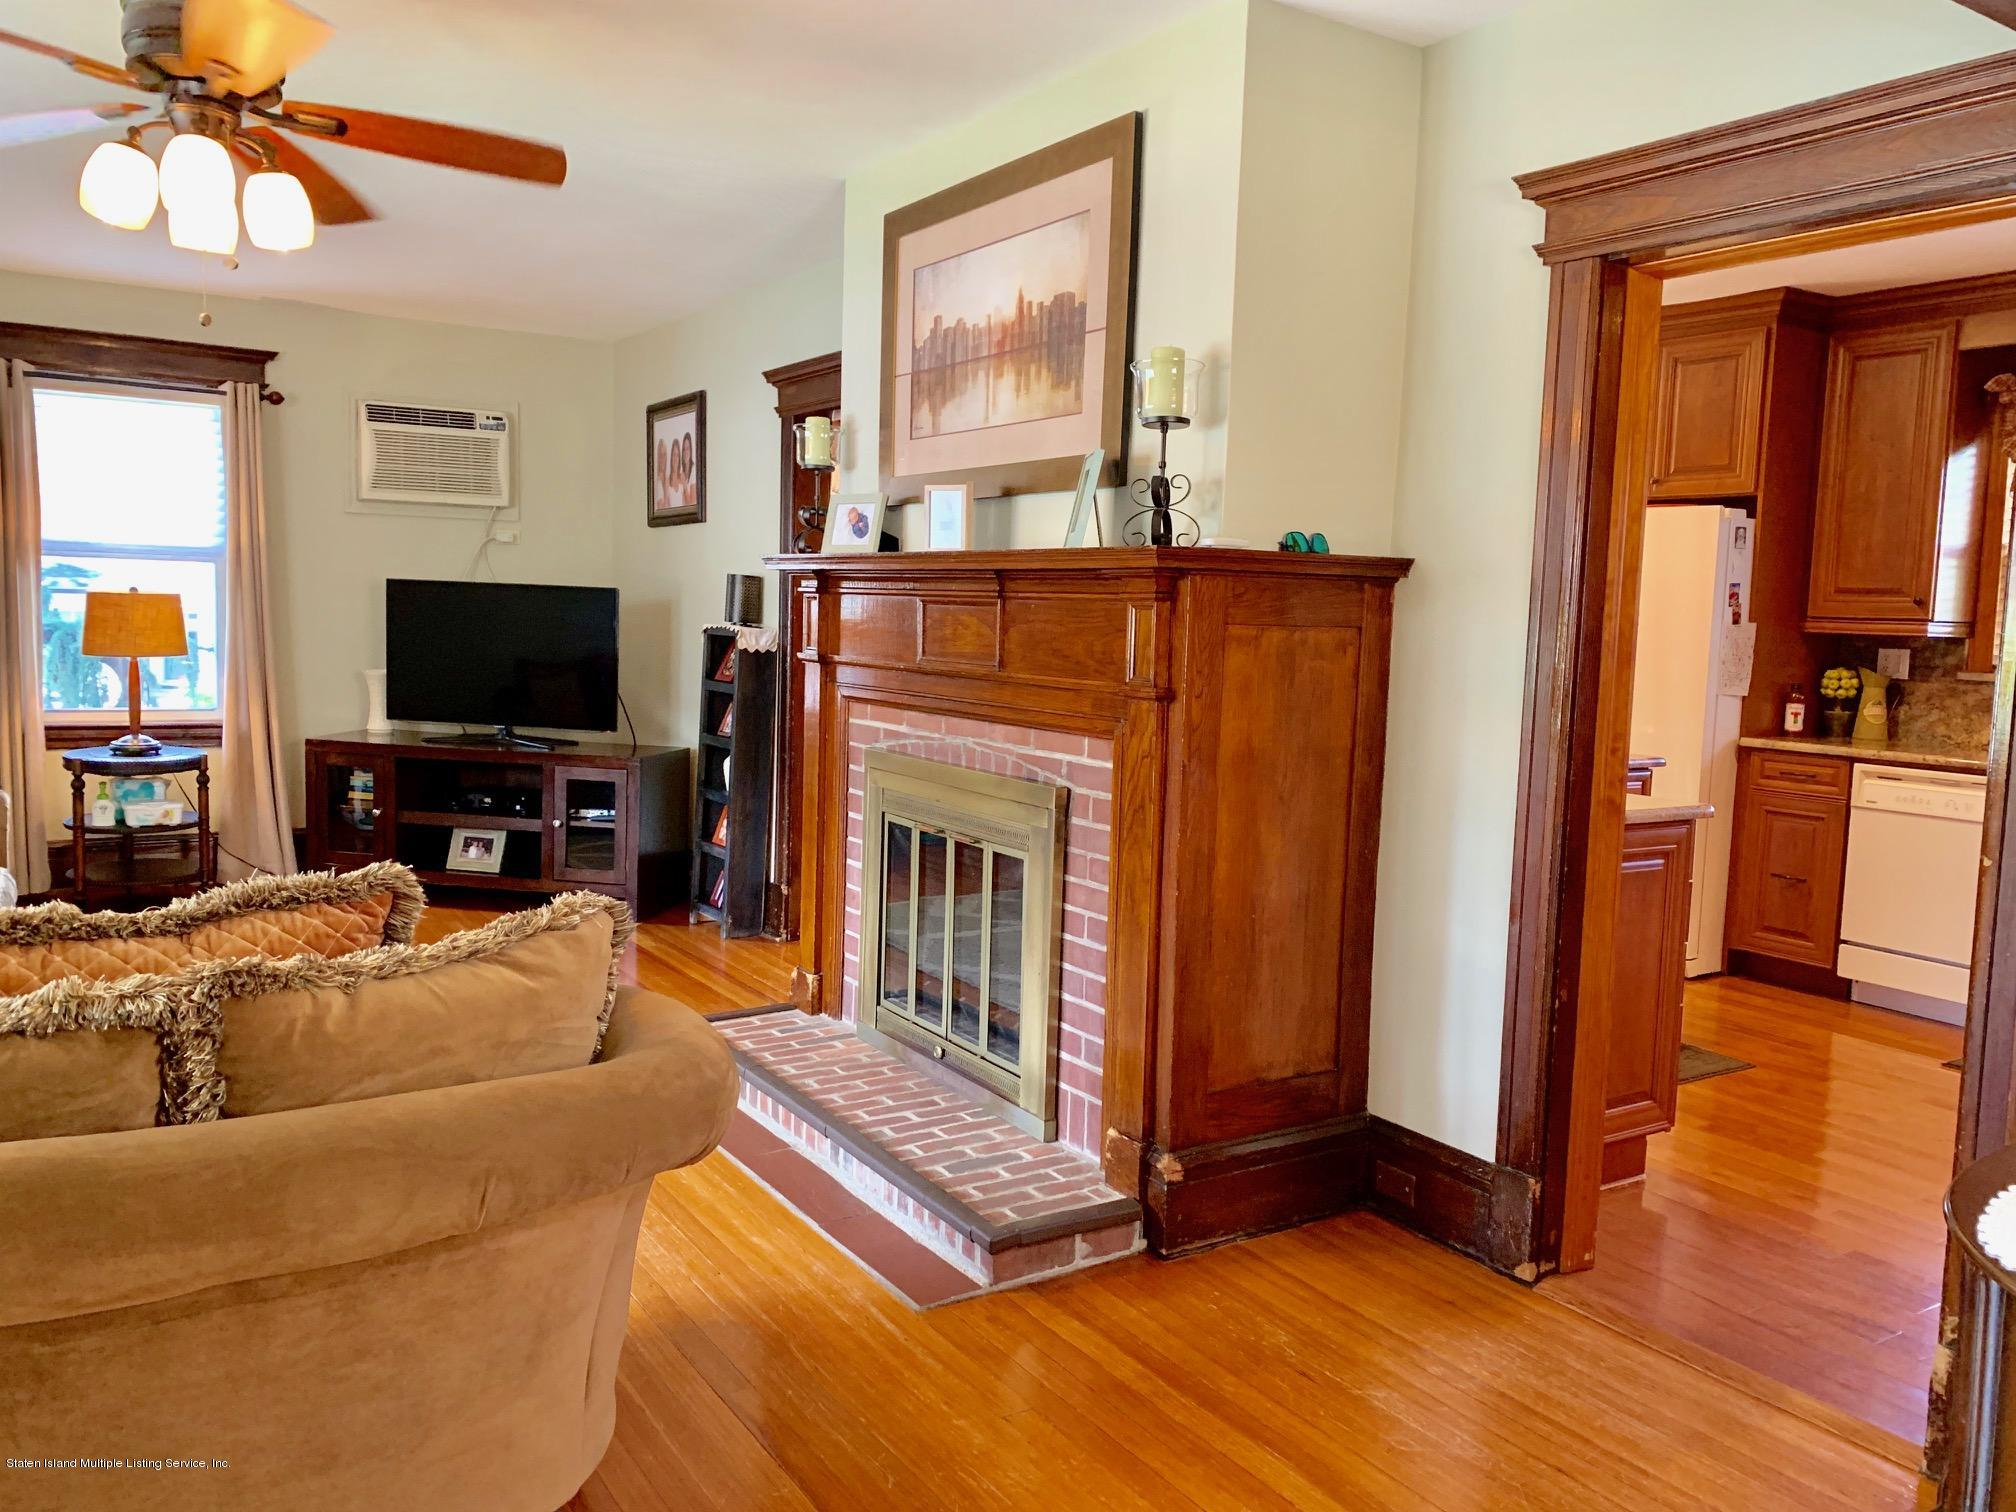 Single Family - Detached 195 Fairview Avenue  Staten Island, NY 10314, MLS-1132423-6